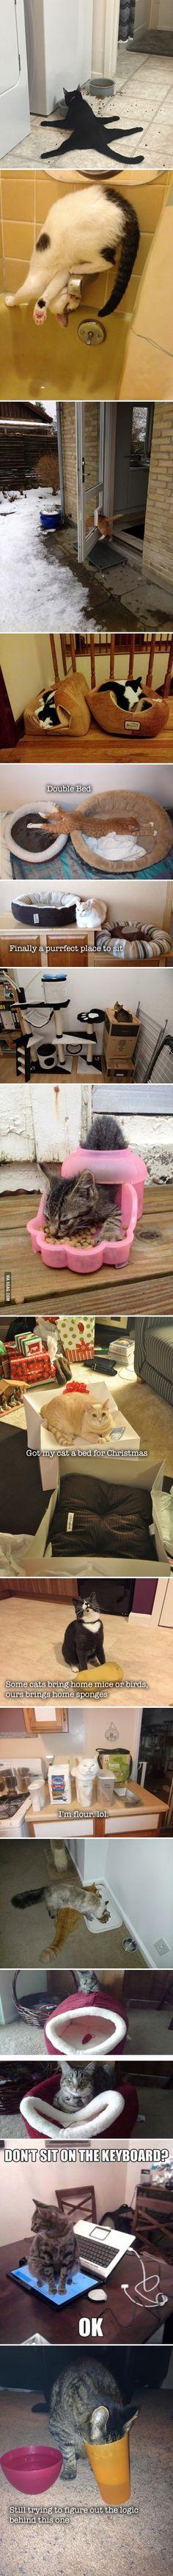 15 Hilarious Examples Of Cat Logics                                                                                                                                                      More